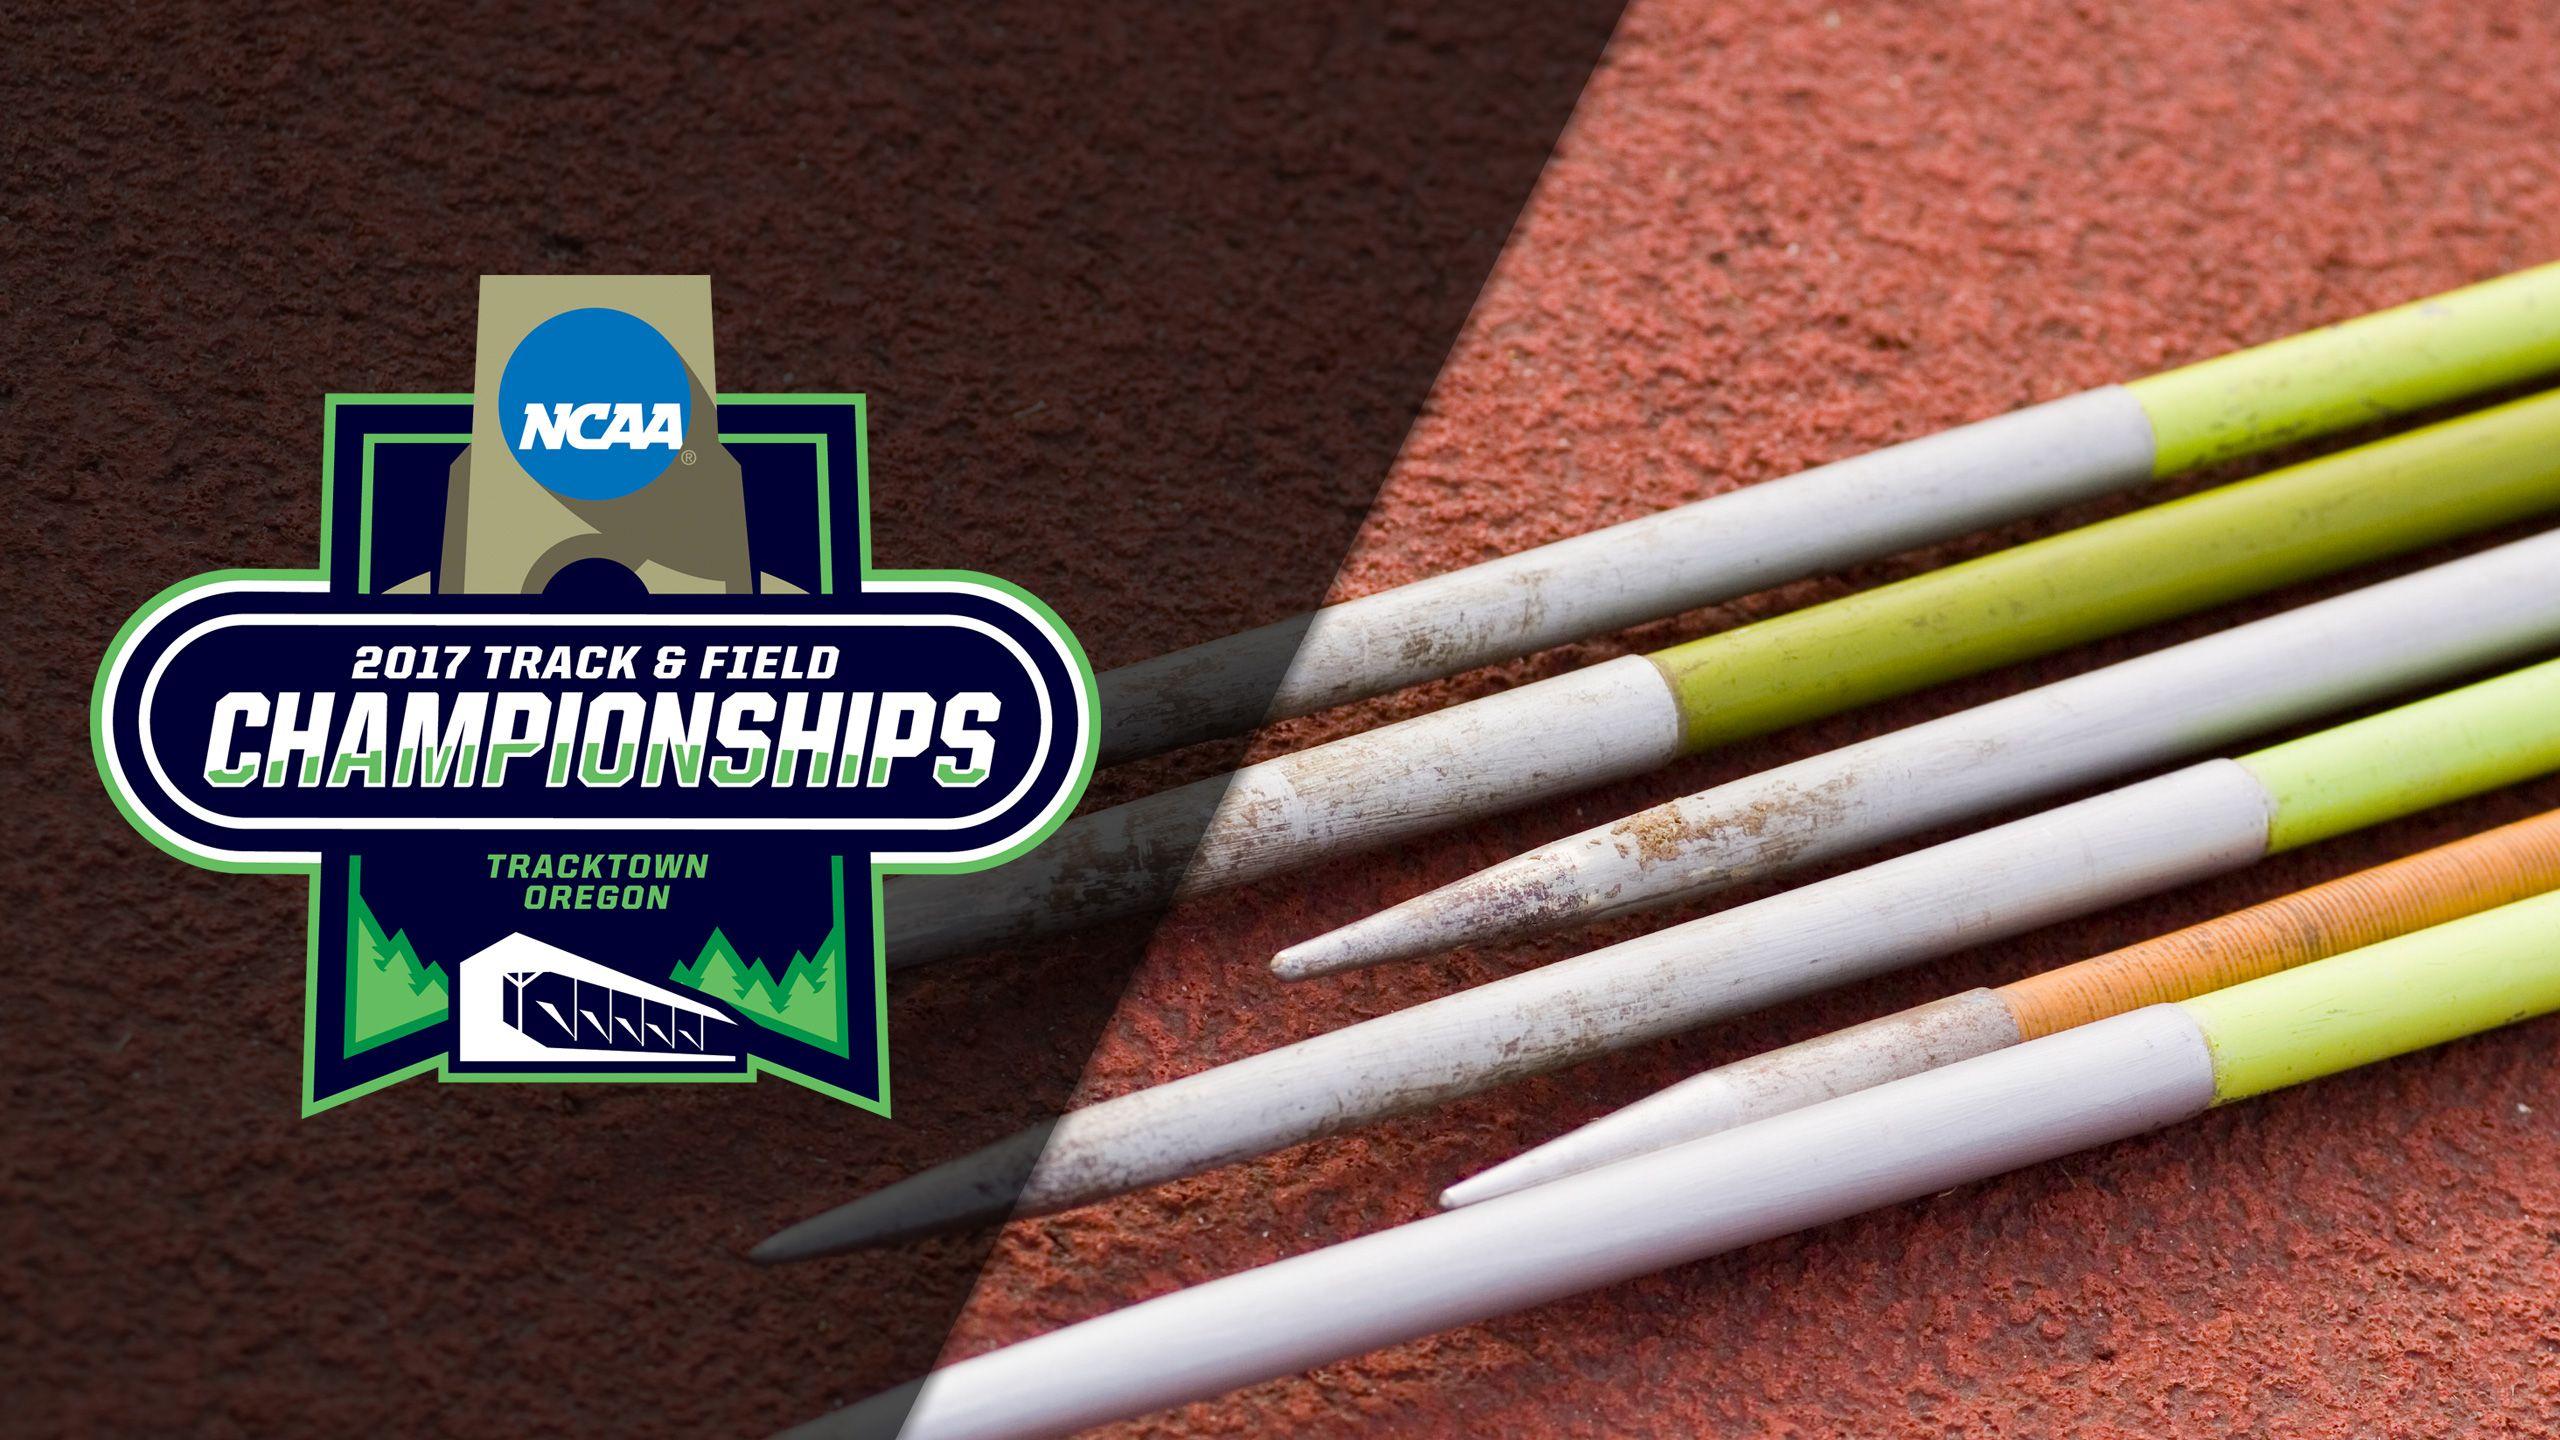 NCAA Track & Field Outdoor Championships - Decathlon: Javelin Throw